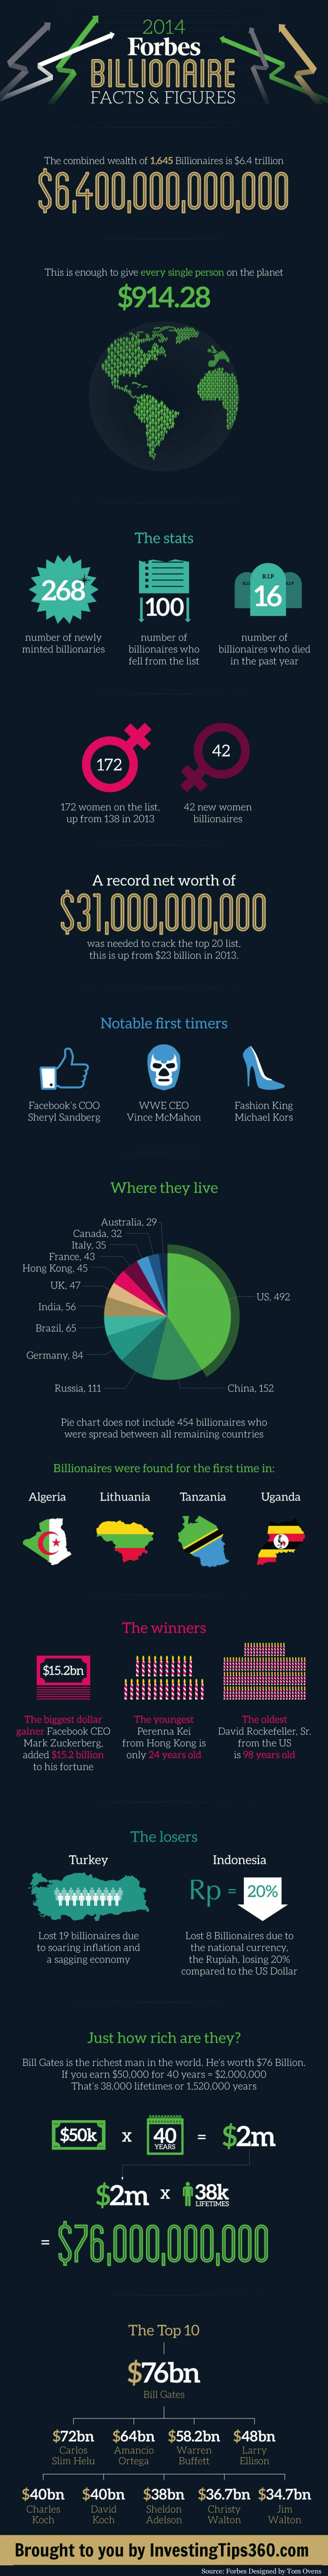 01 2014-forbes-billionaire-list-facts--figures_533a913b257c4_w1500